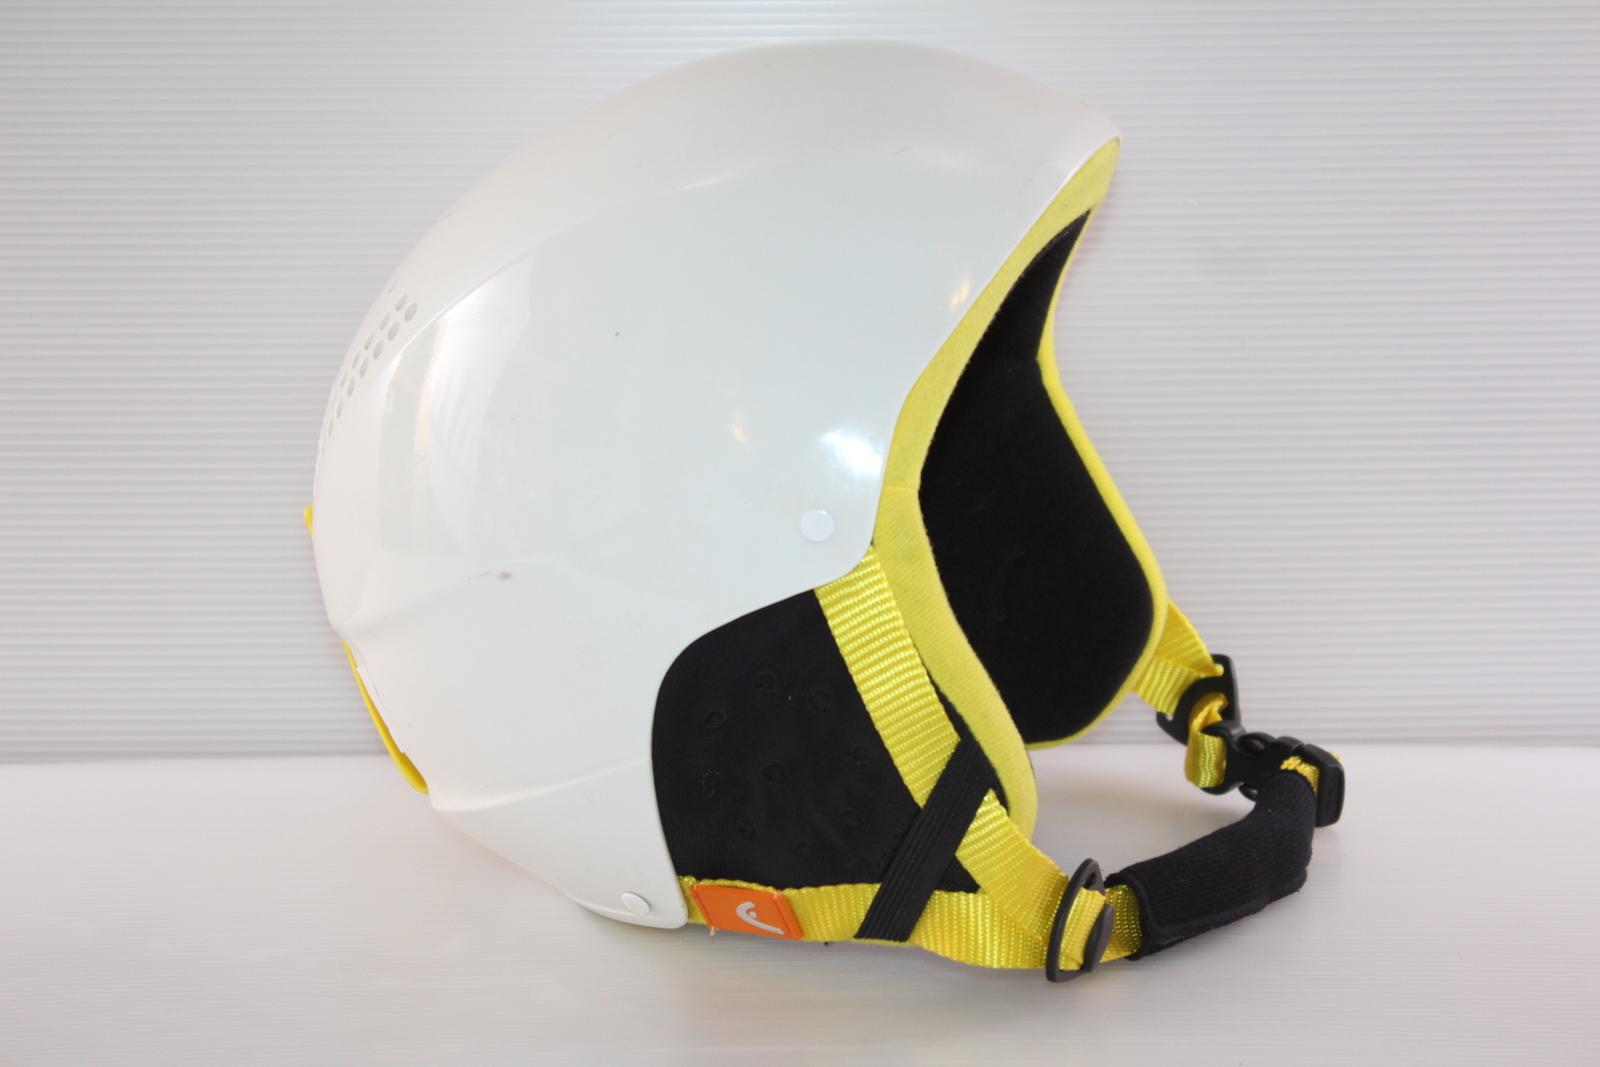 Dětská lyžařská helma Head Ventor Youth R - posuvná vel. 49 - 51